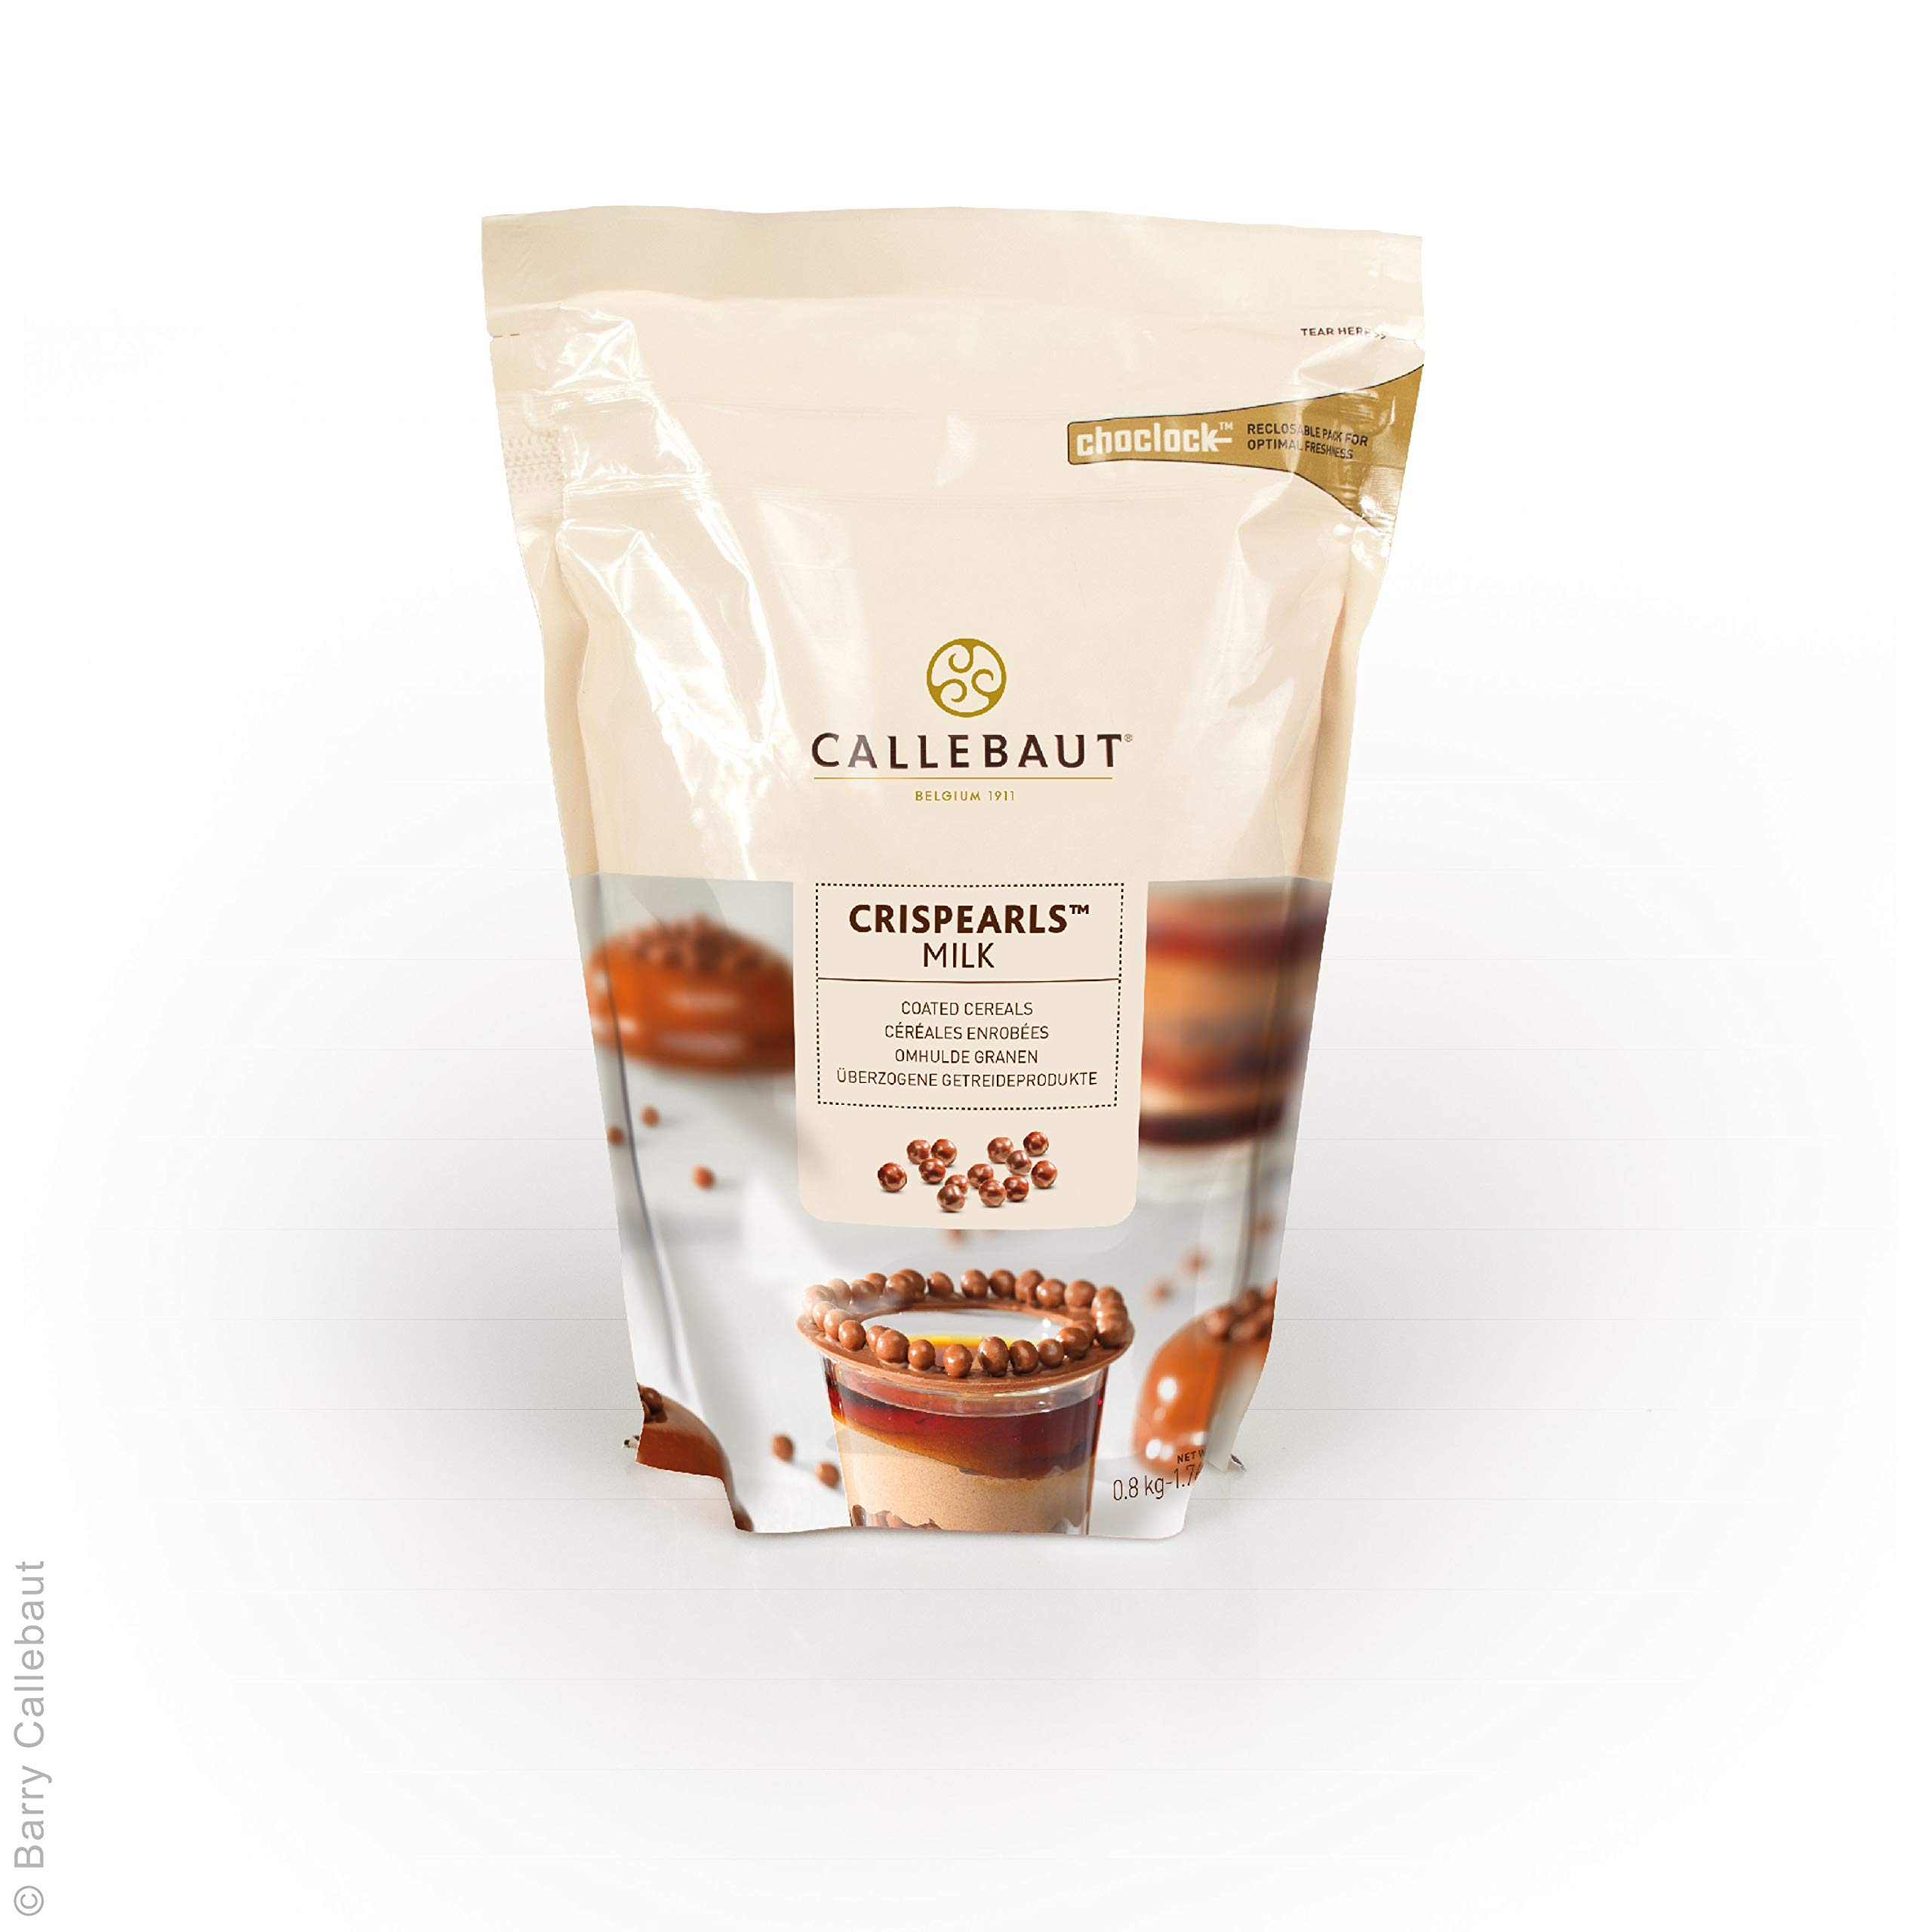 Callebaut Milk Chocolate Crispearls - Toasted Biscuit Pearls Coated in Milk Chocolate 800g